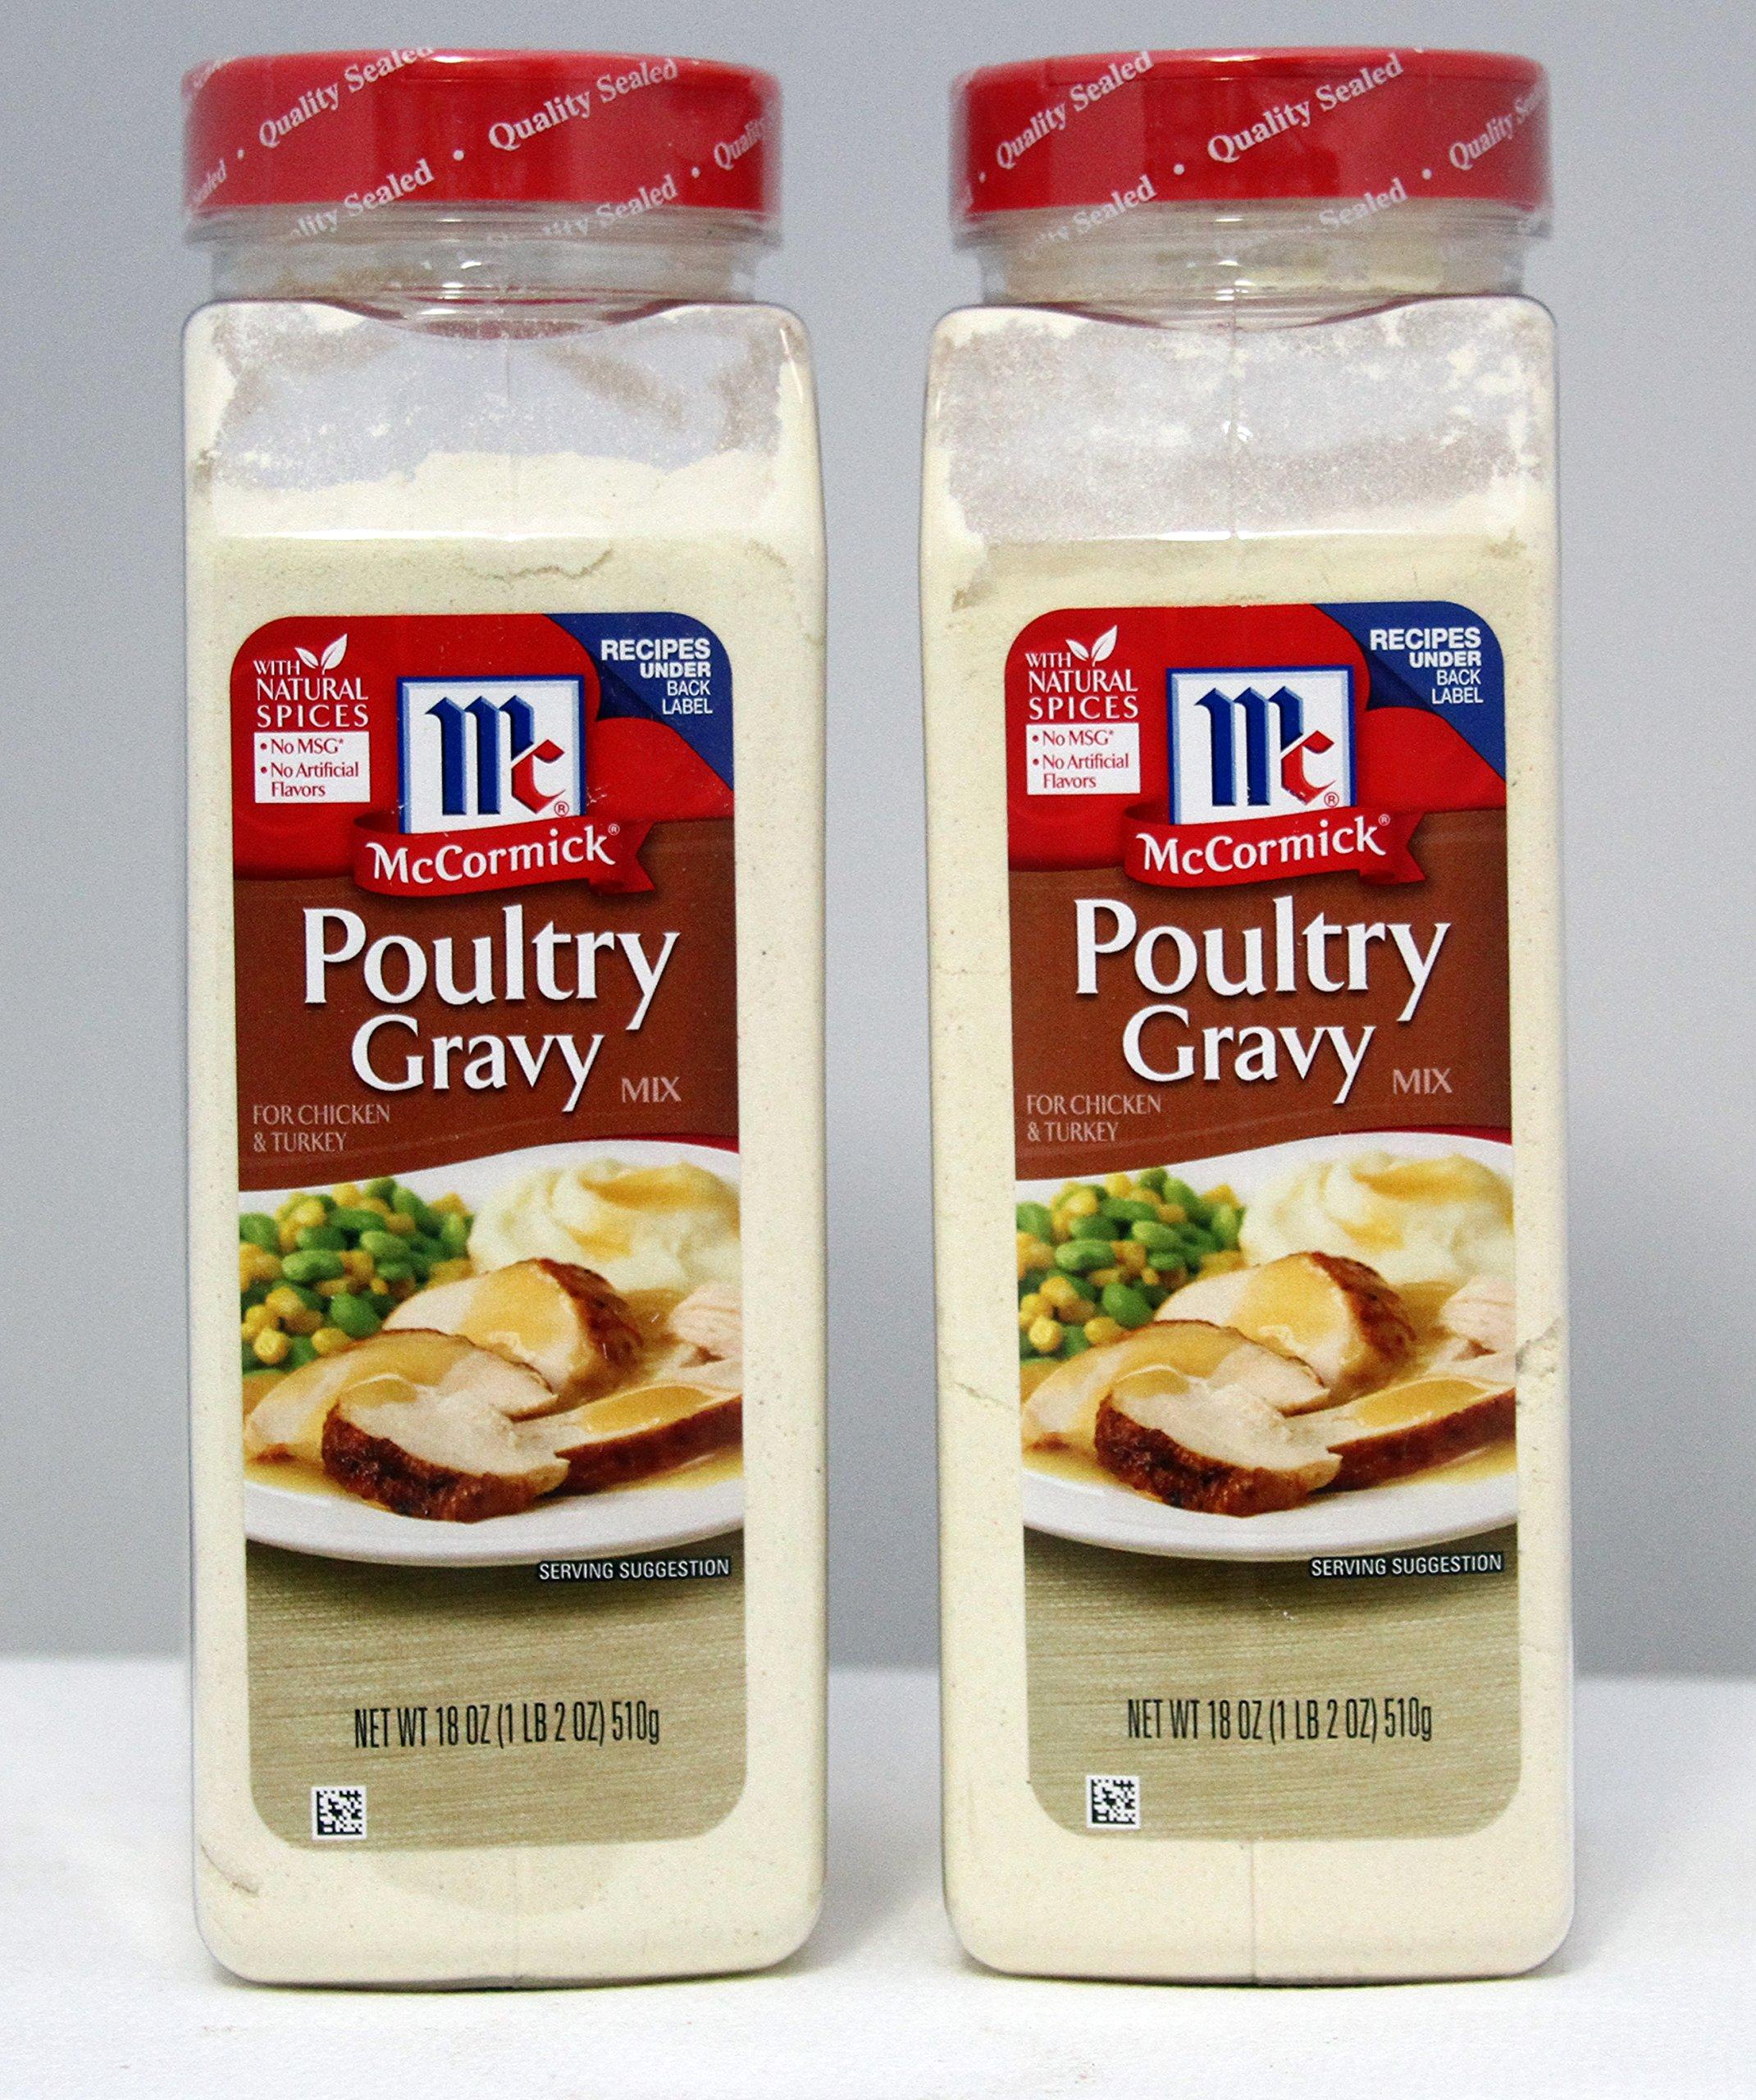 McCormick Poultry Gravy, 18 oz. (2 pack)